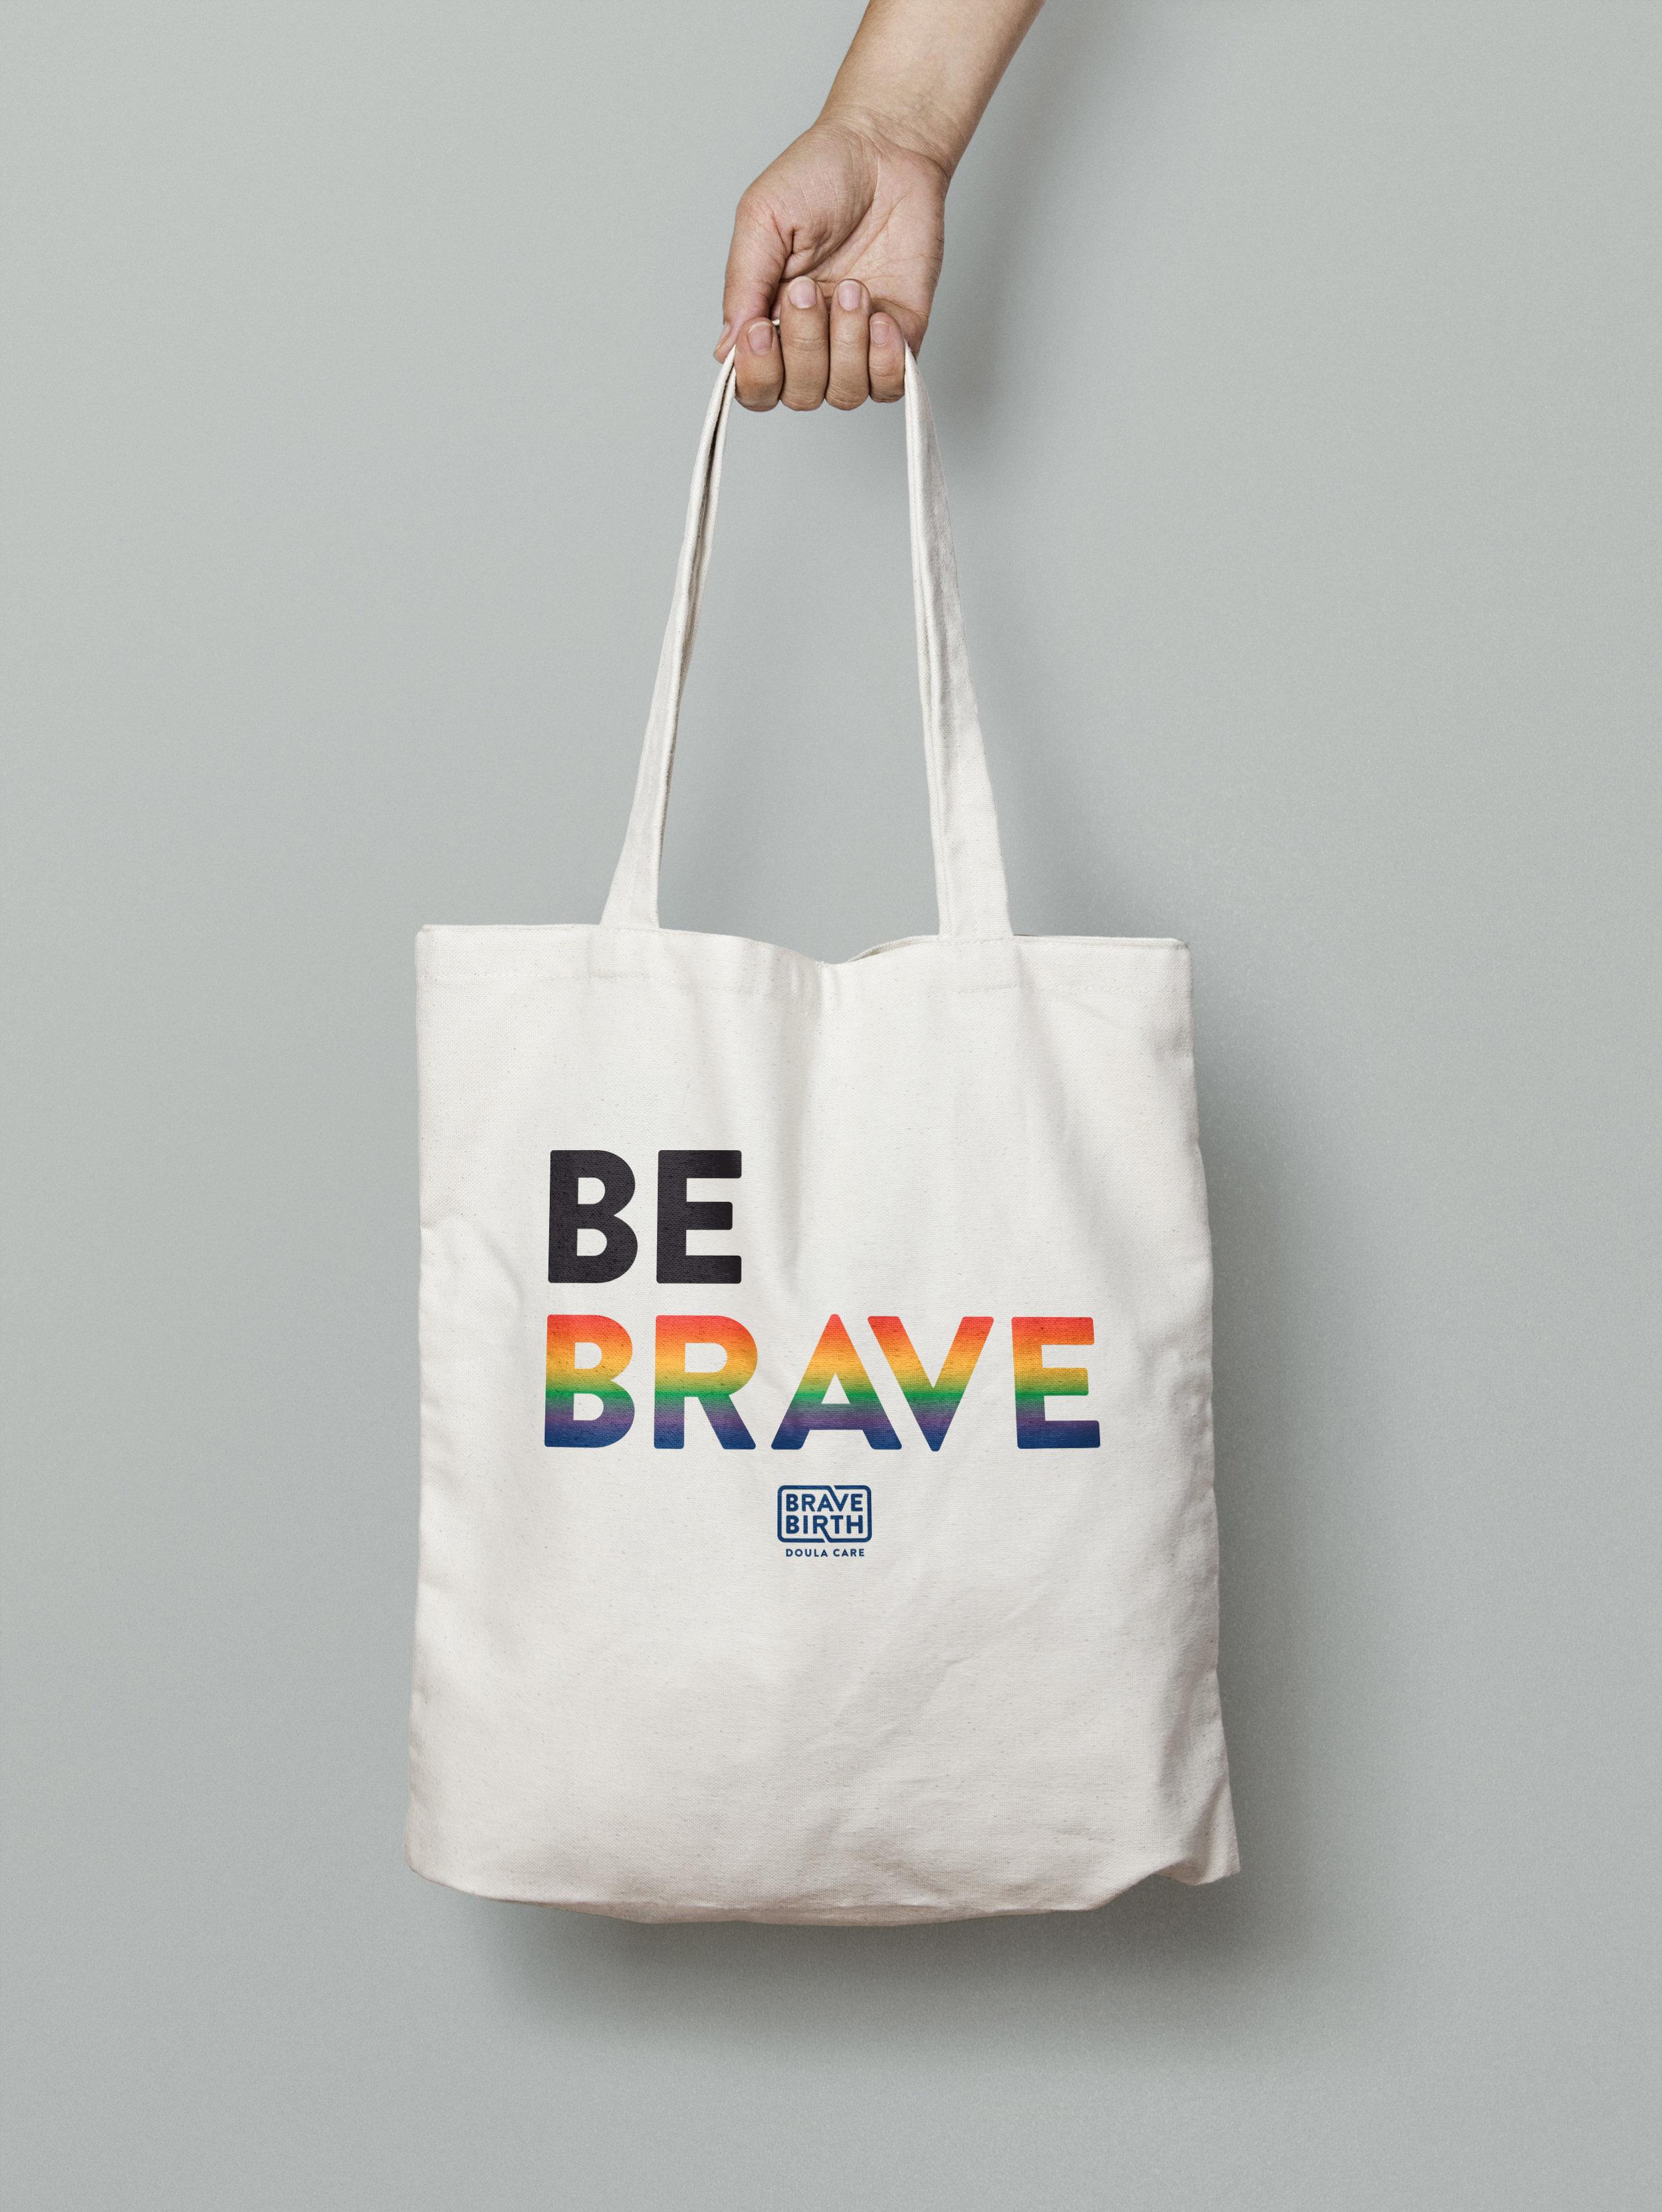 Brave_Birth_tote_bag_pride_parade_PDX_zilka.jpg